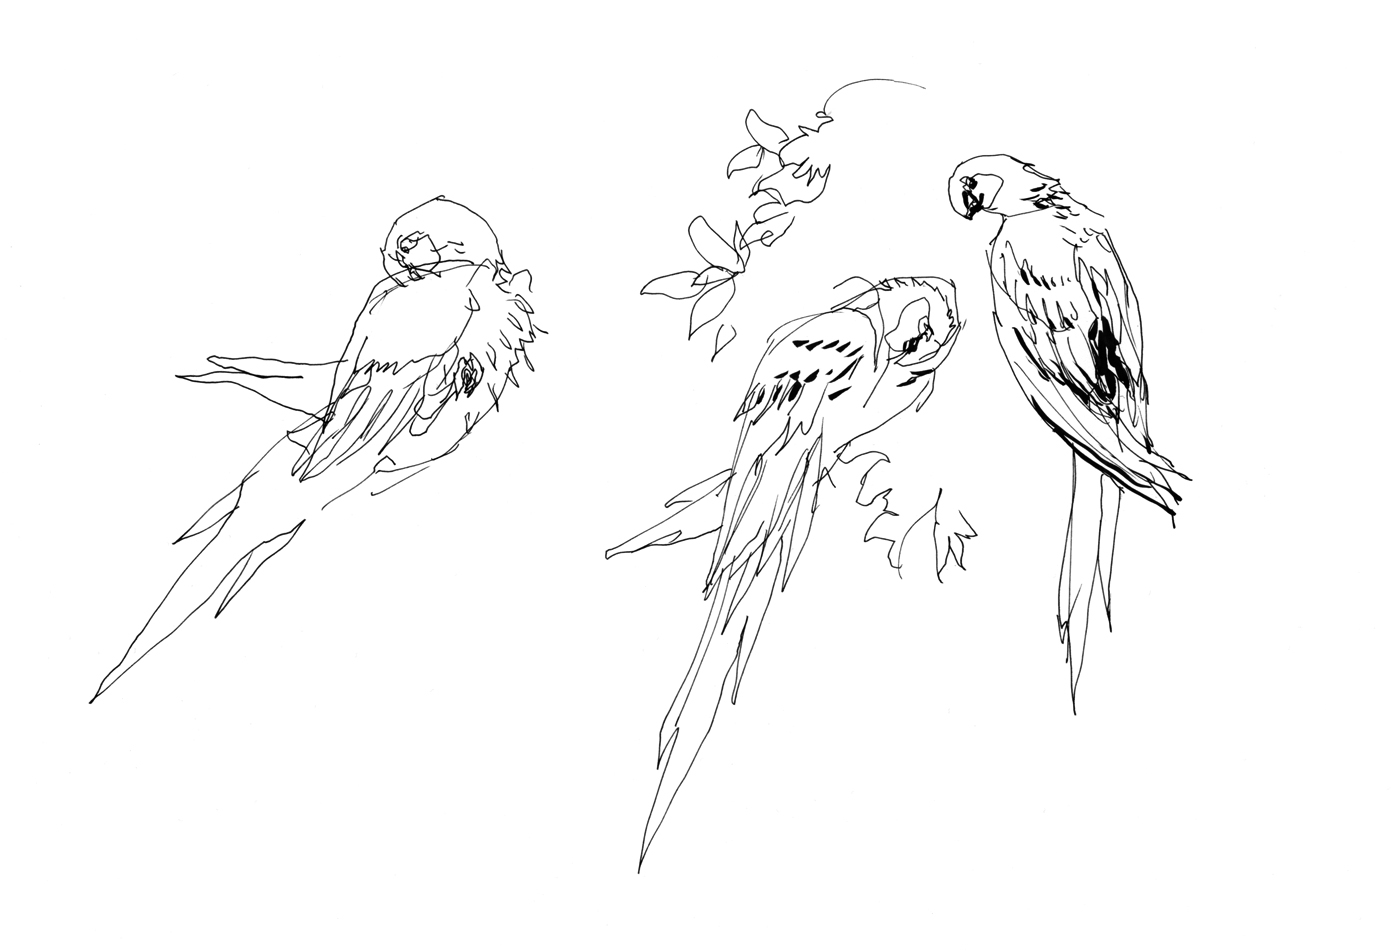 sketching birds from life video demonstration citizen sketcher